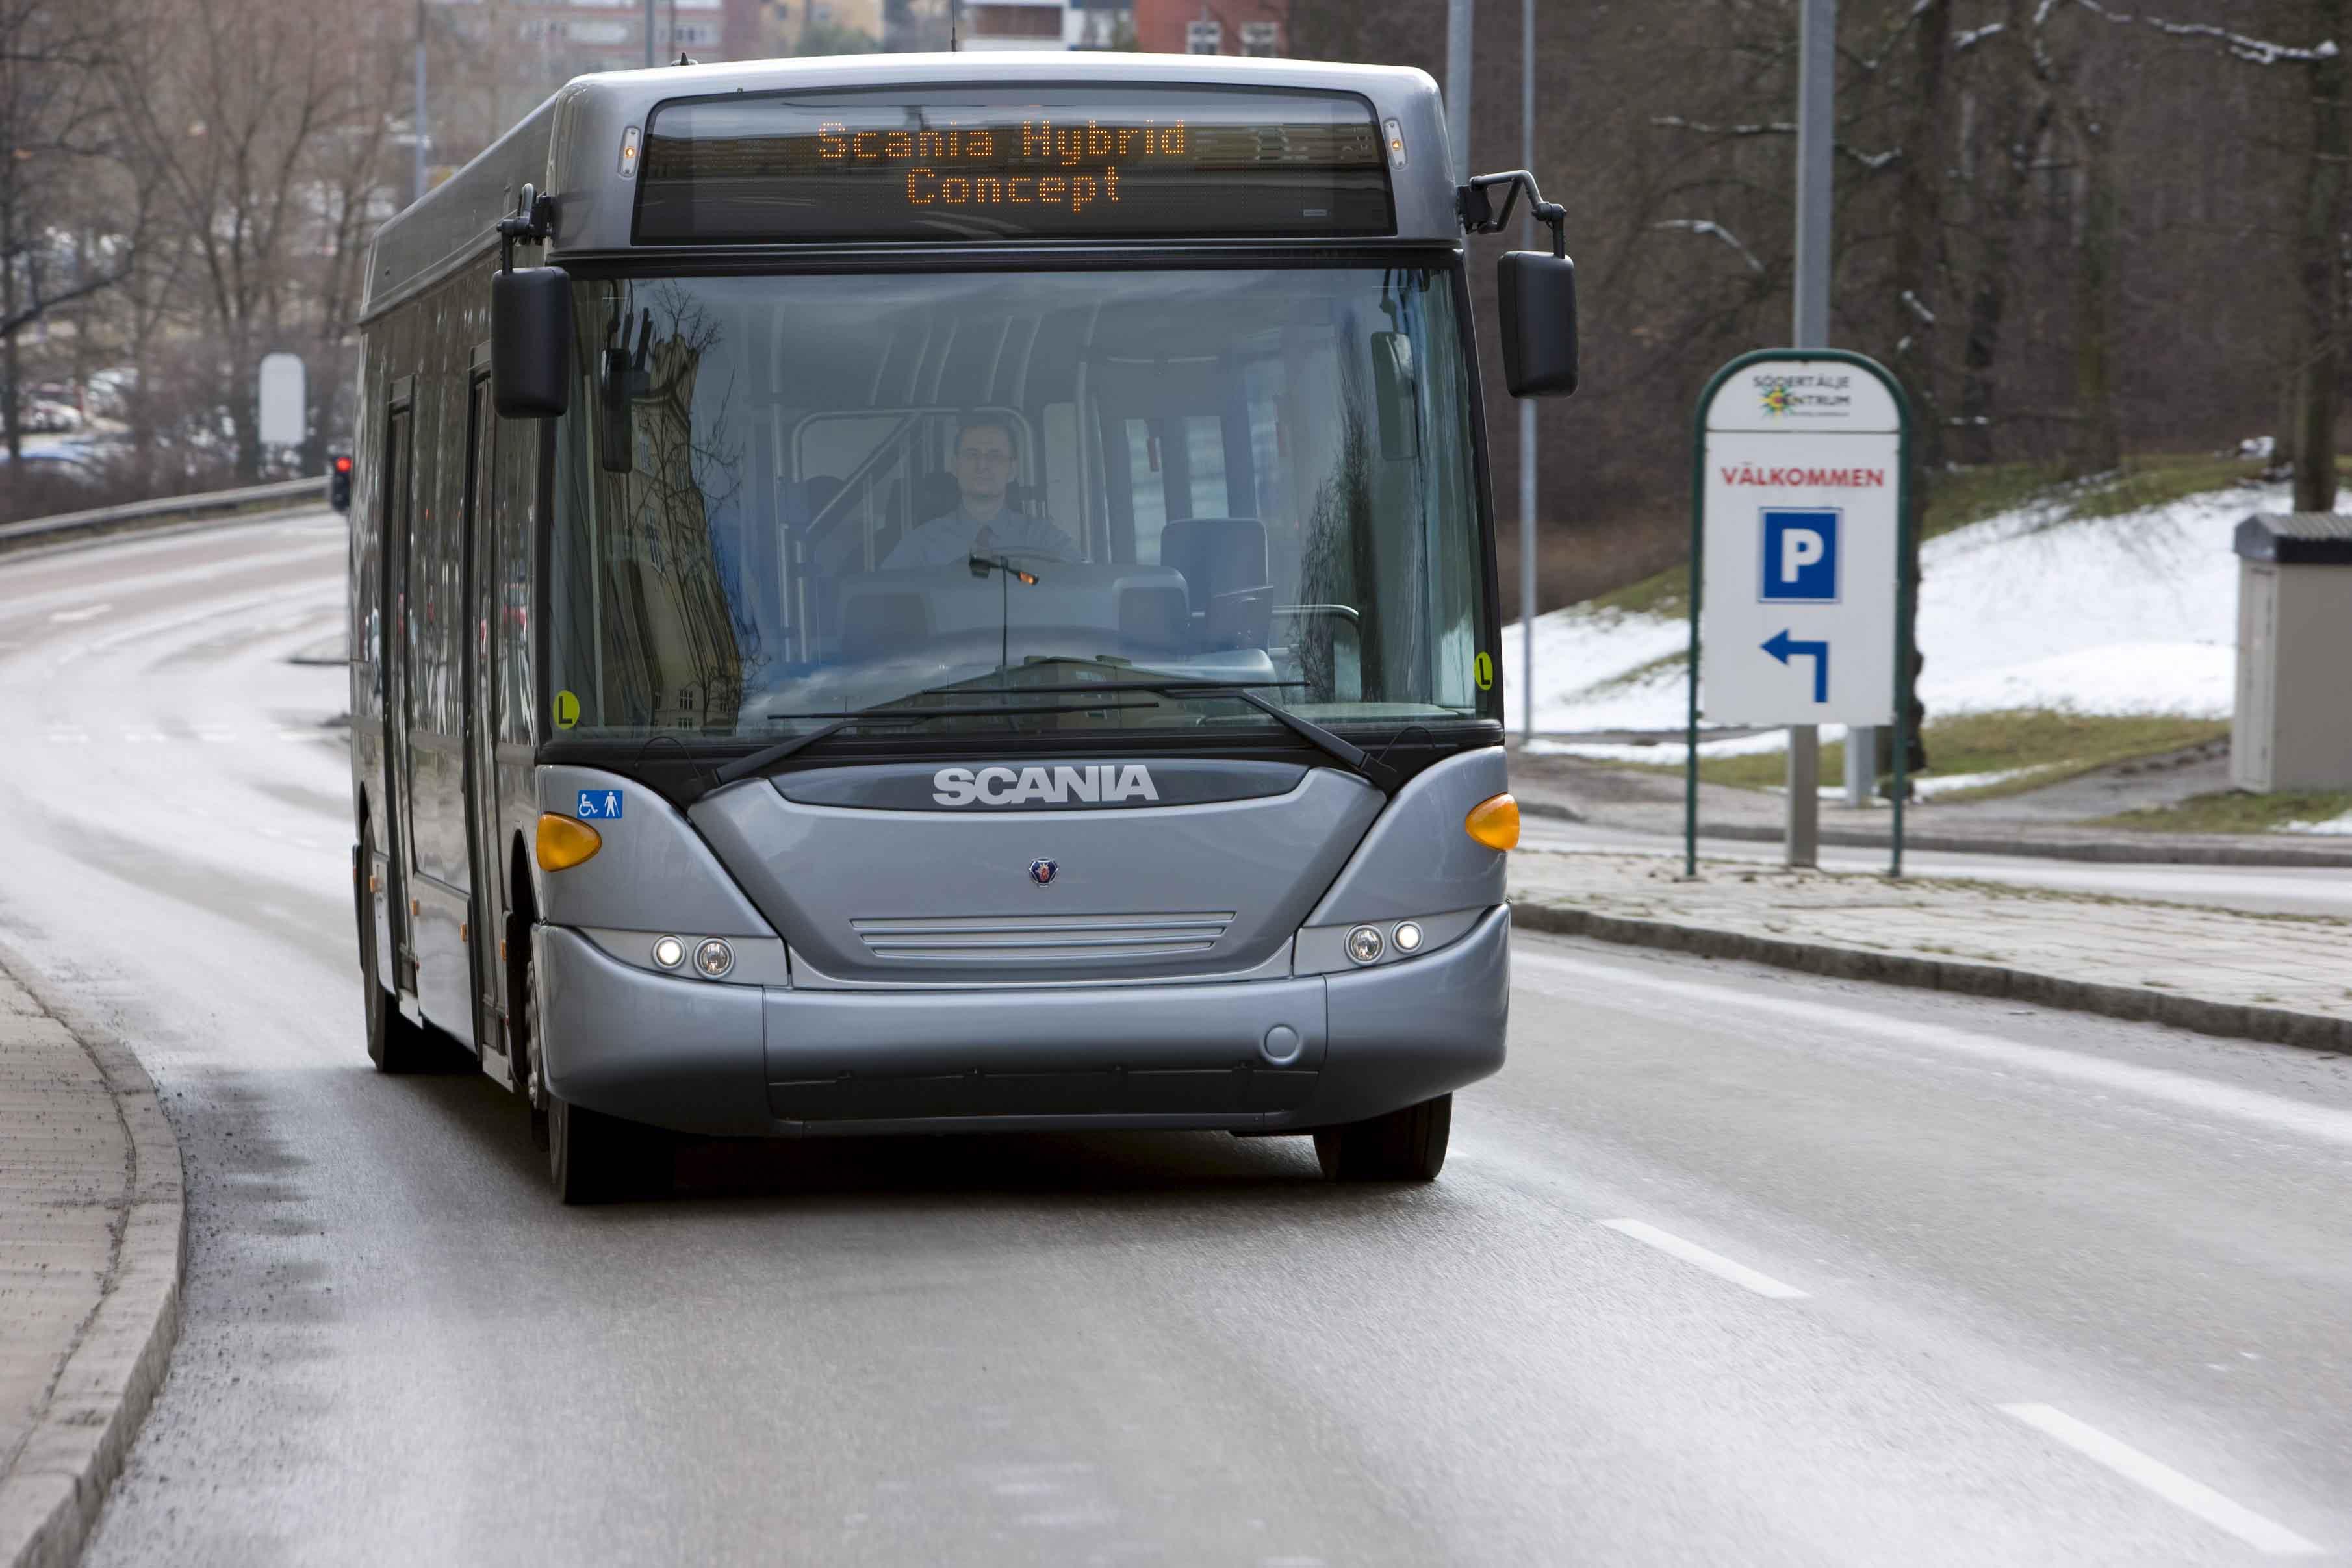 Scania hibrid buszok